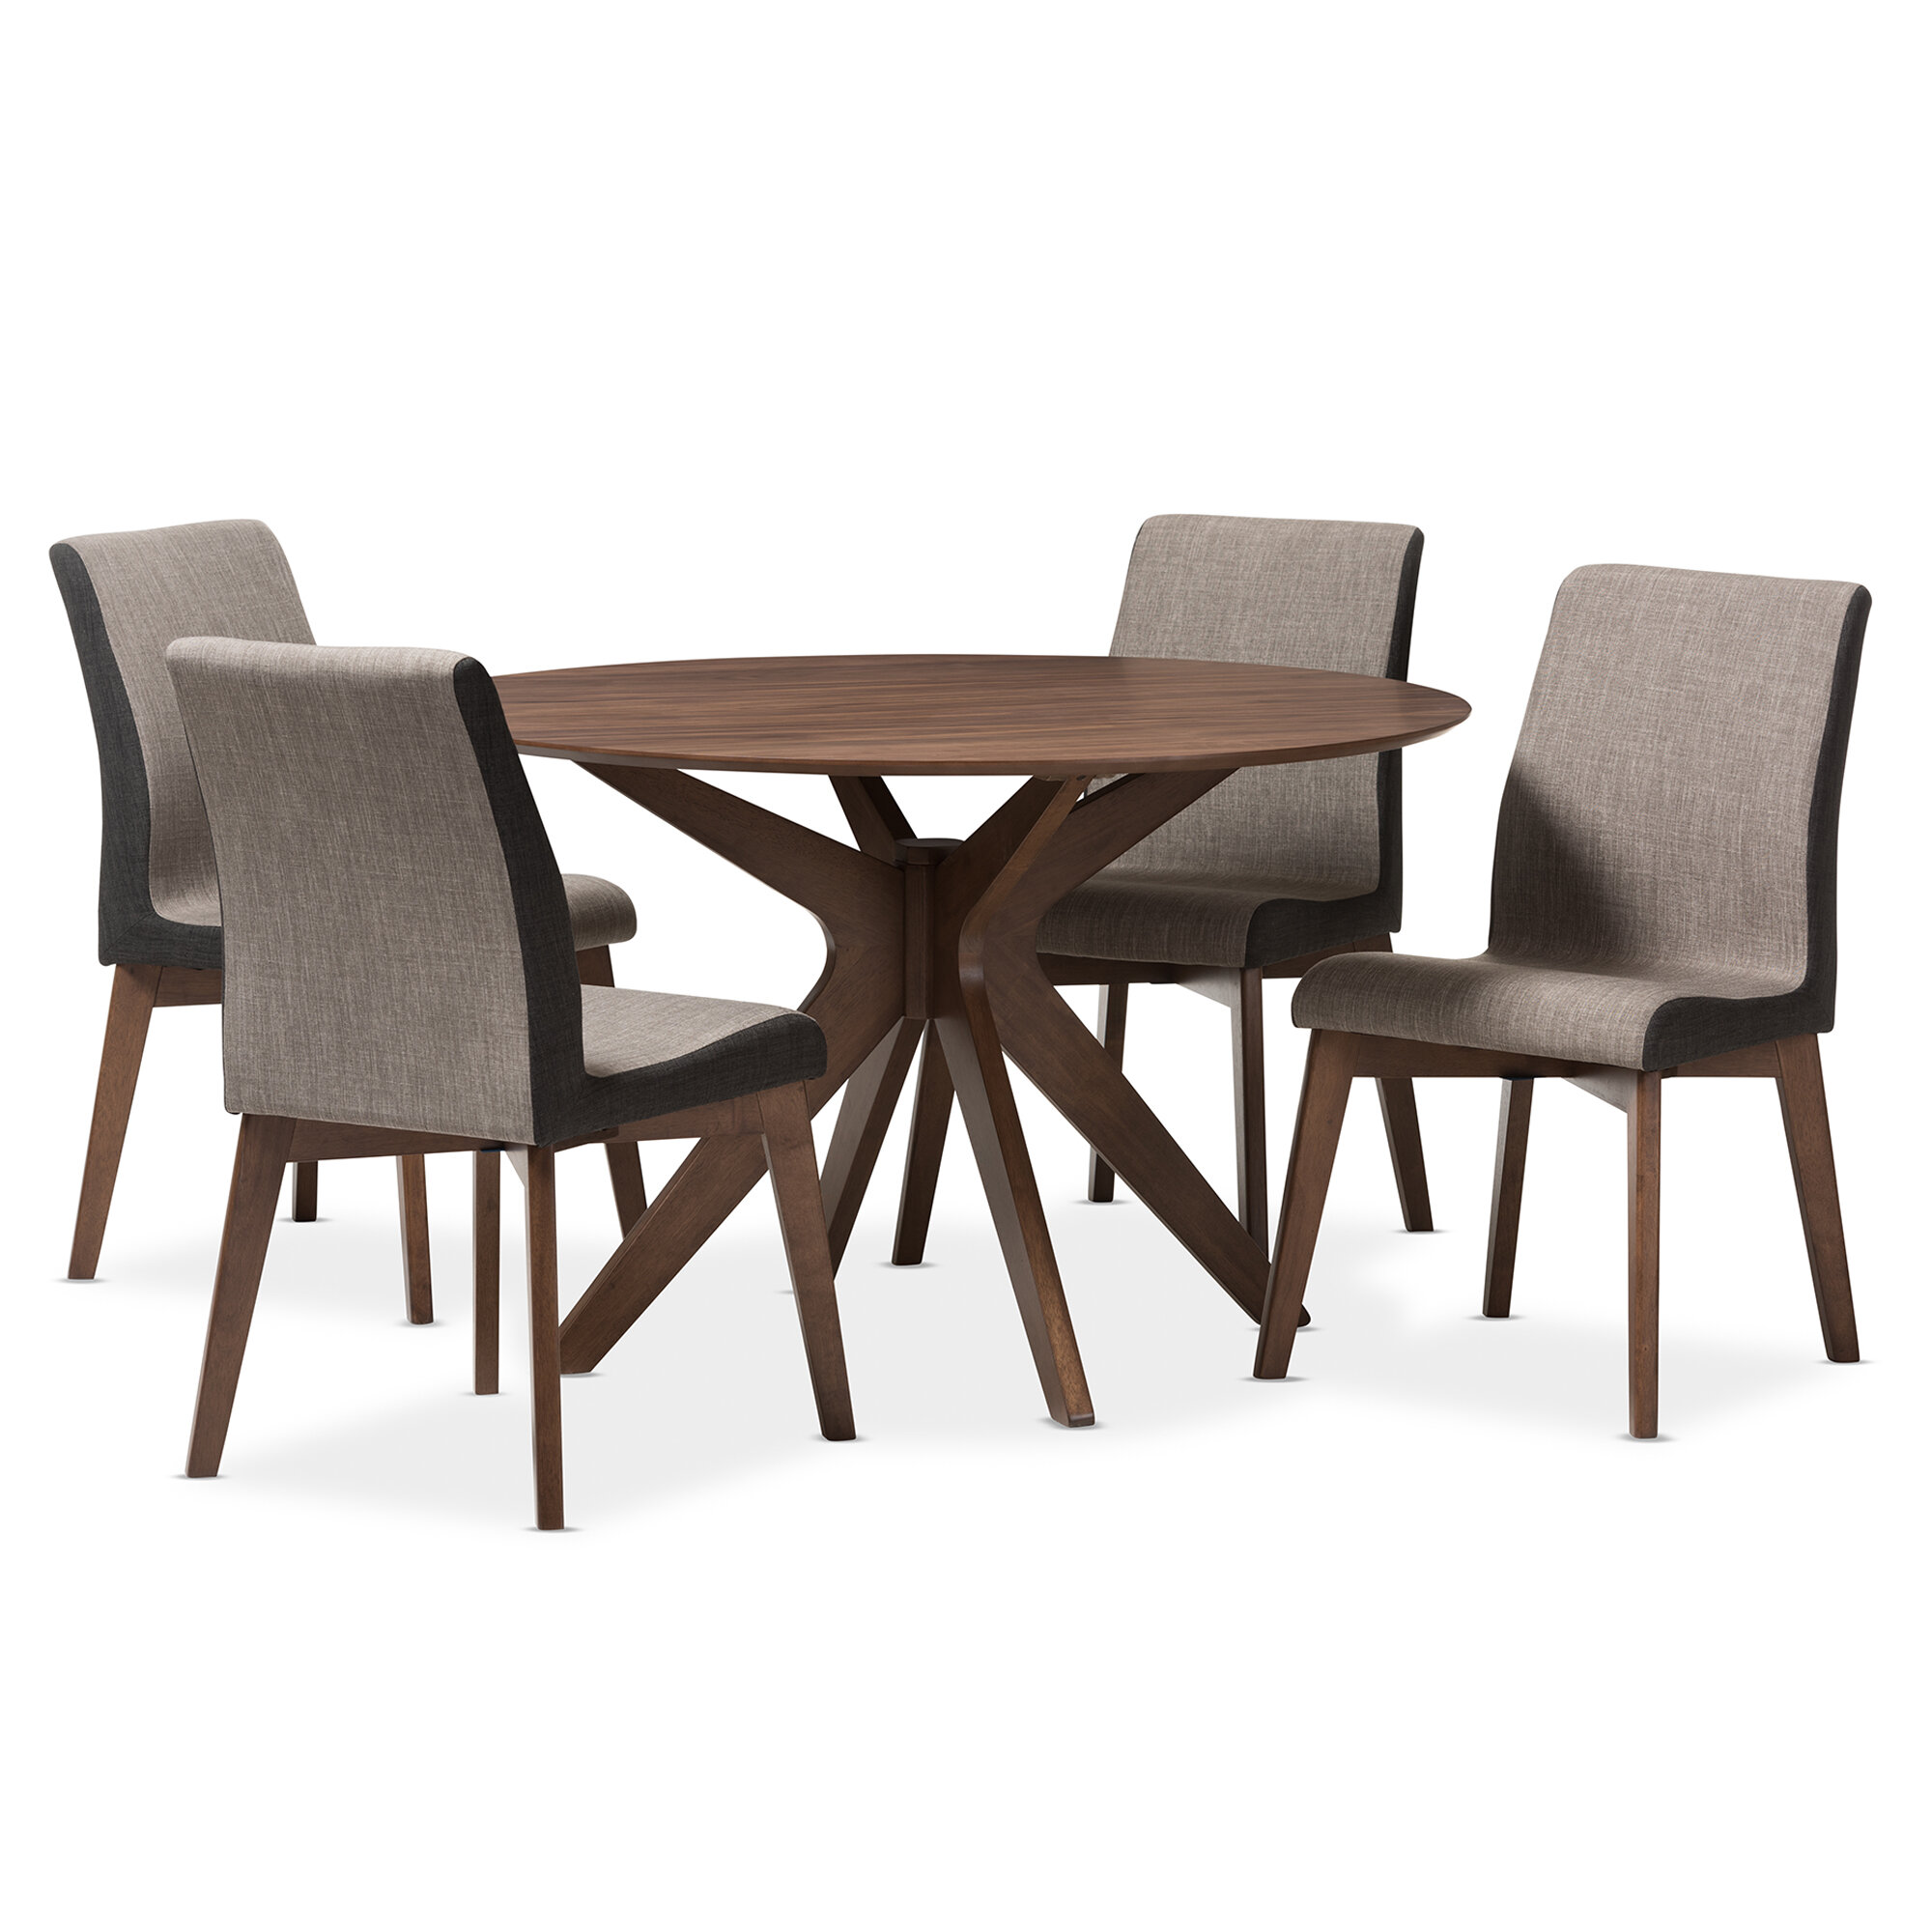 Wholesale Interiors Kimberly Mid Century Modern Wood Round 5 Piece